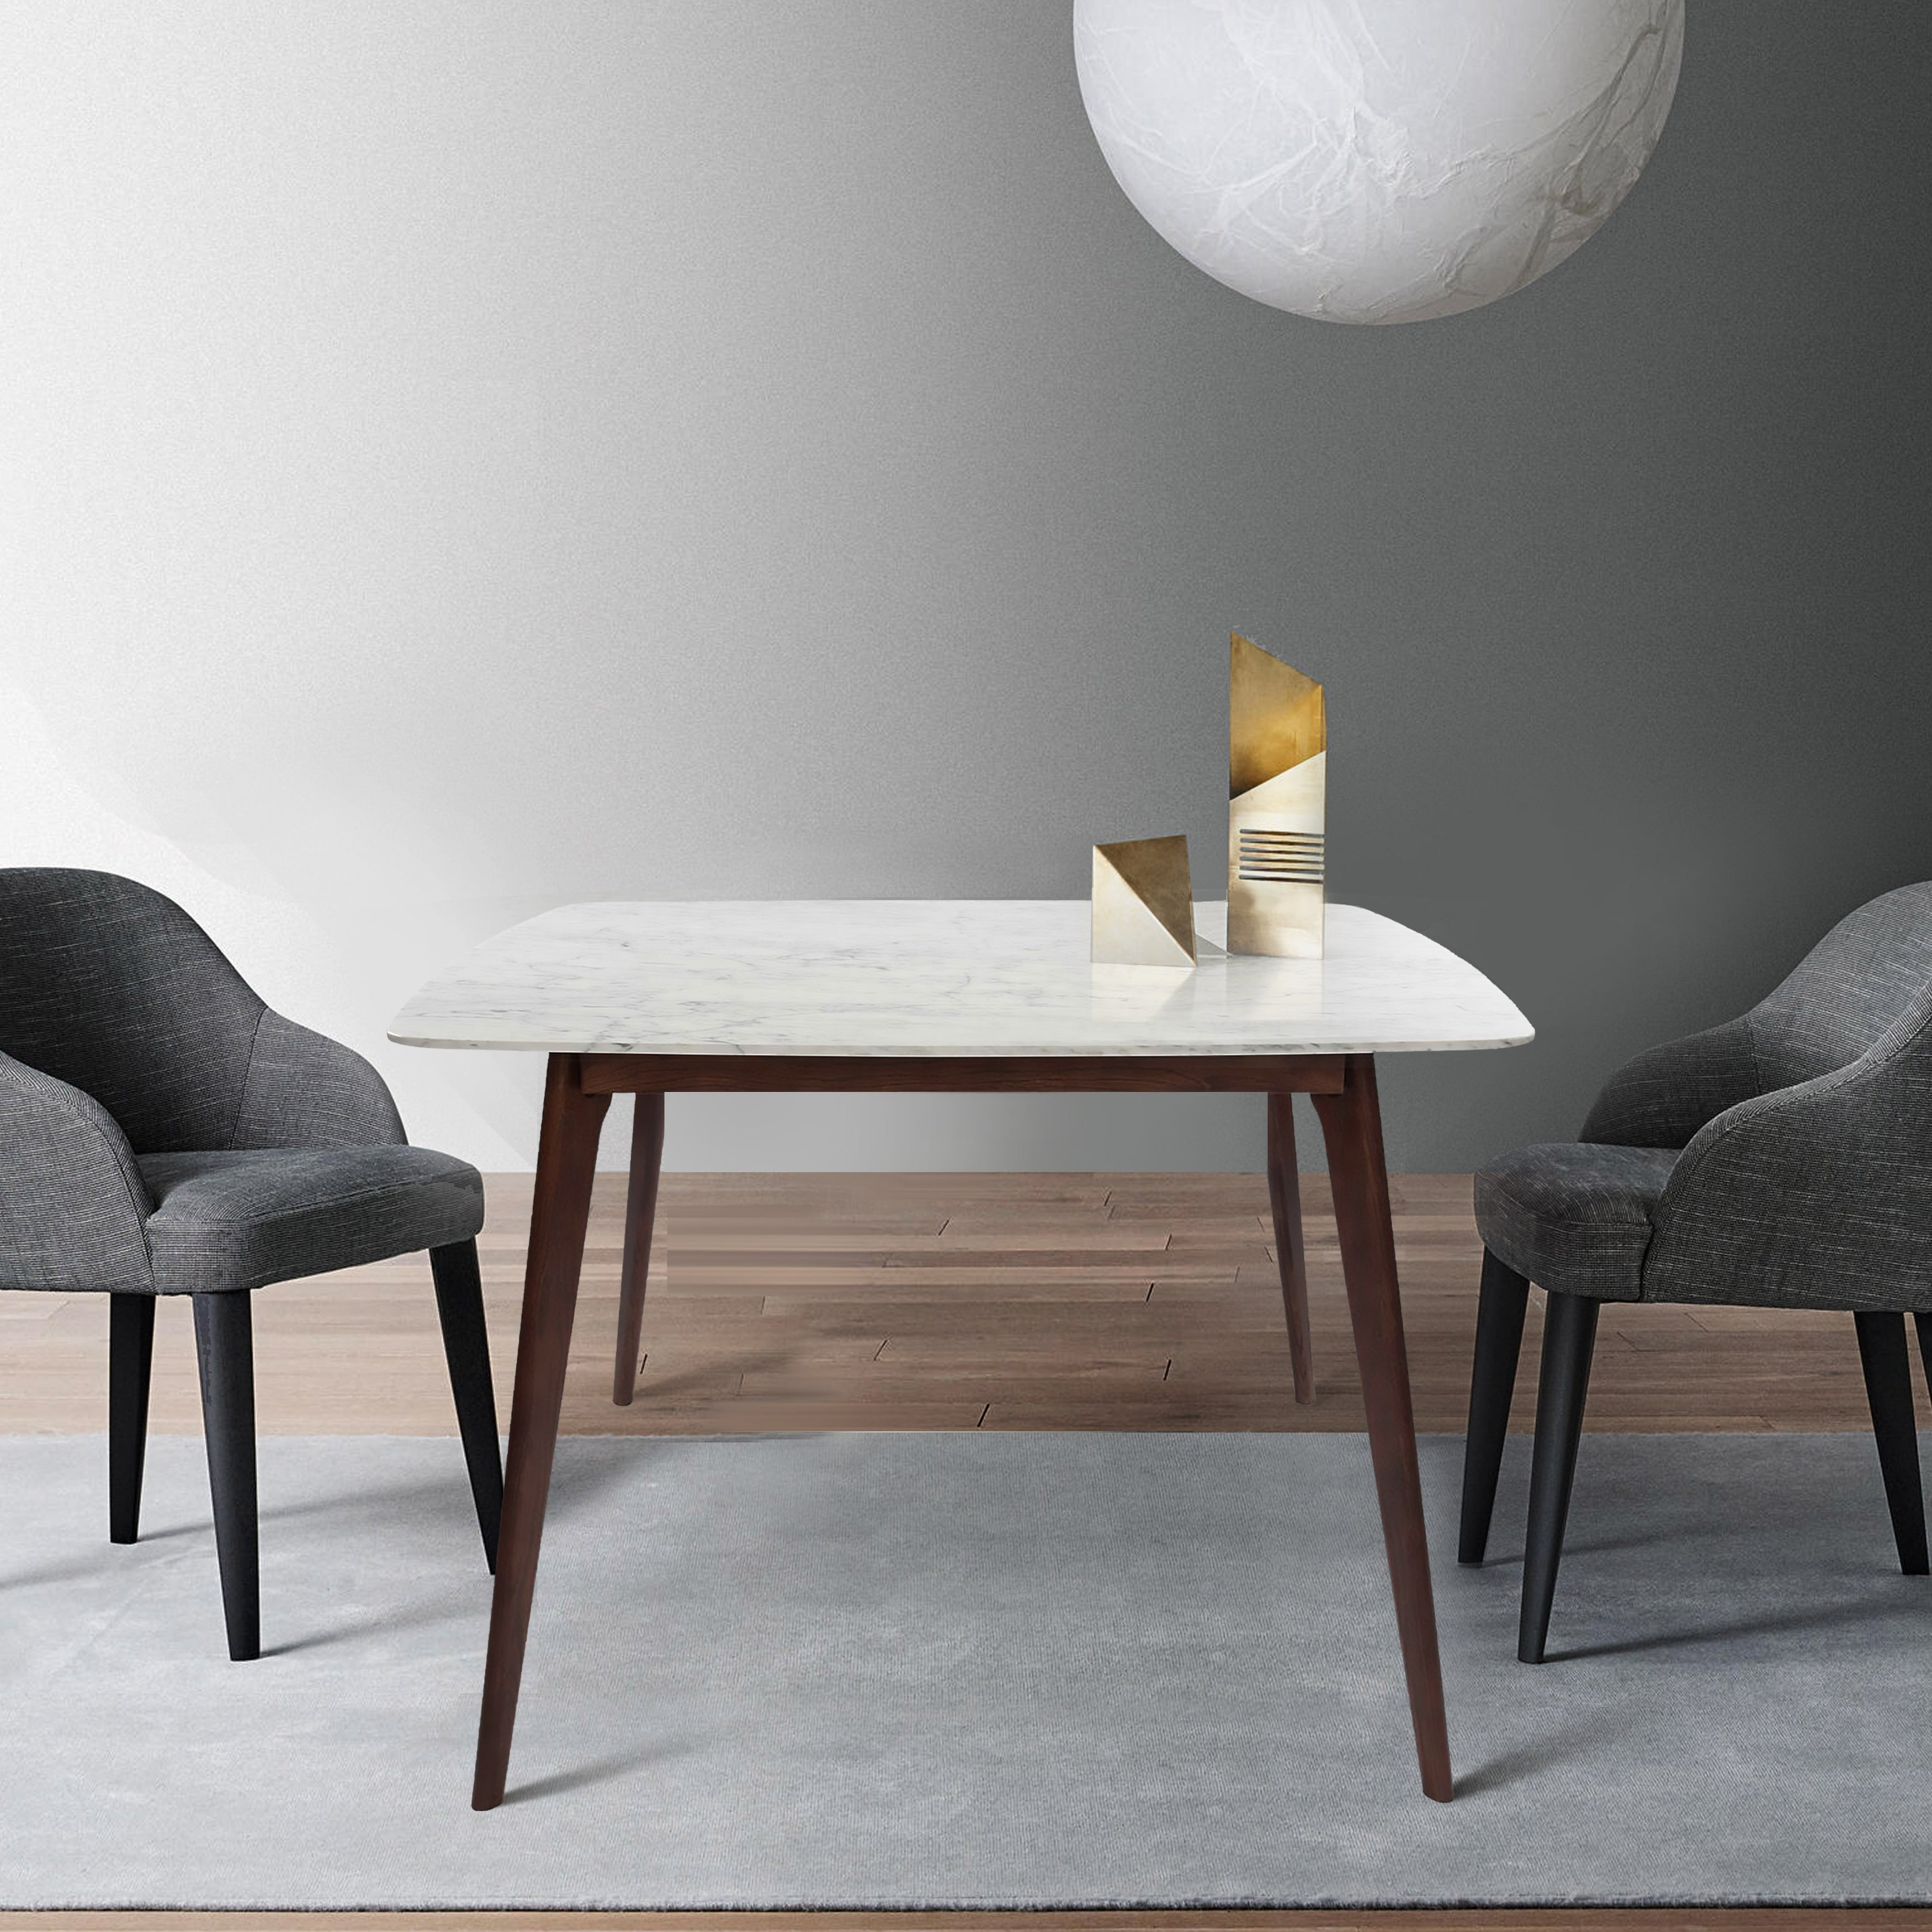 Senna 39 Square Italian Carrara White Marble Dining Table With Walnut Legs 39 L X 39 W X 29 5 H Overstock 29770369